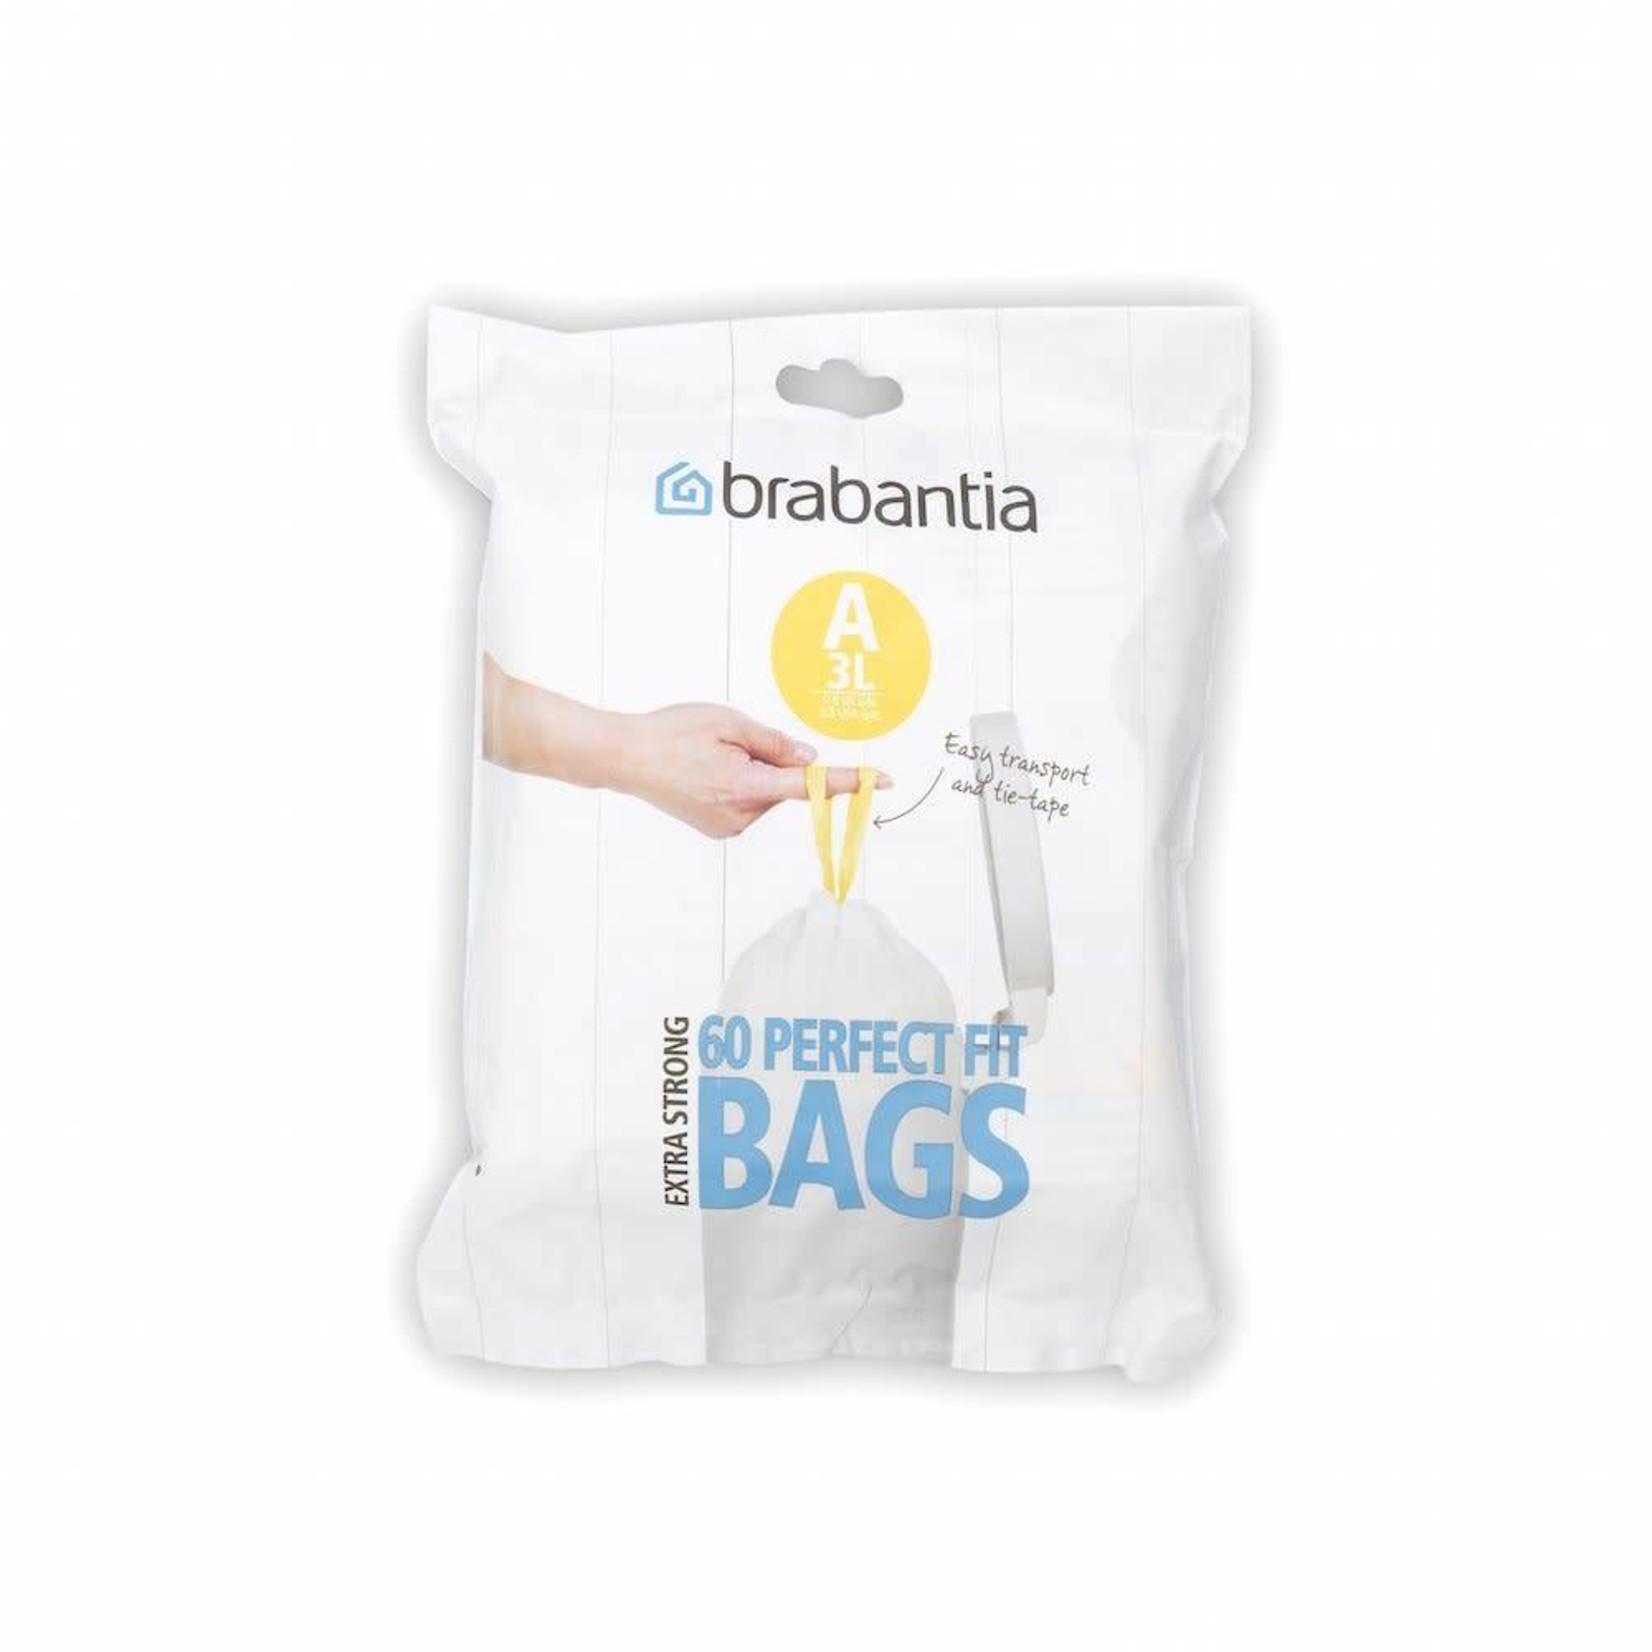 Brabantia BRABANTIA PERFECTFIT BAGS A, 3 LITRE [DISPENSER PACK OF 60 BAGS]